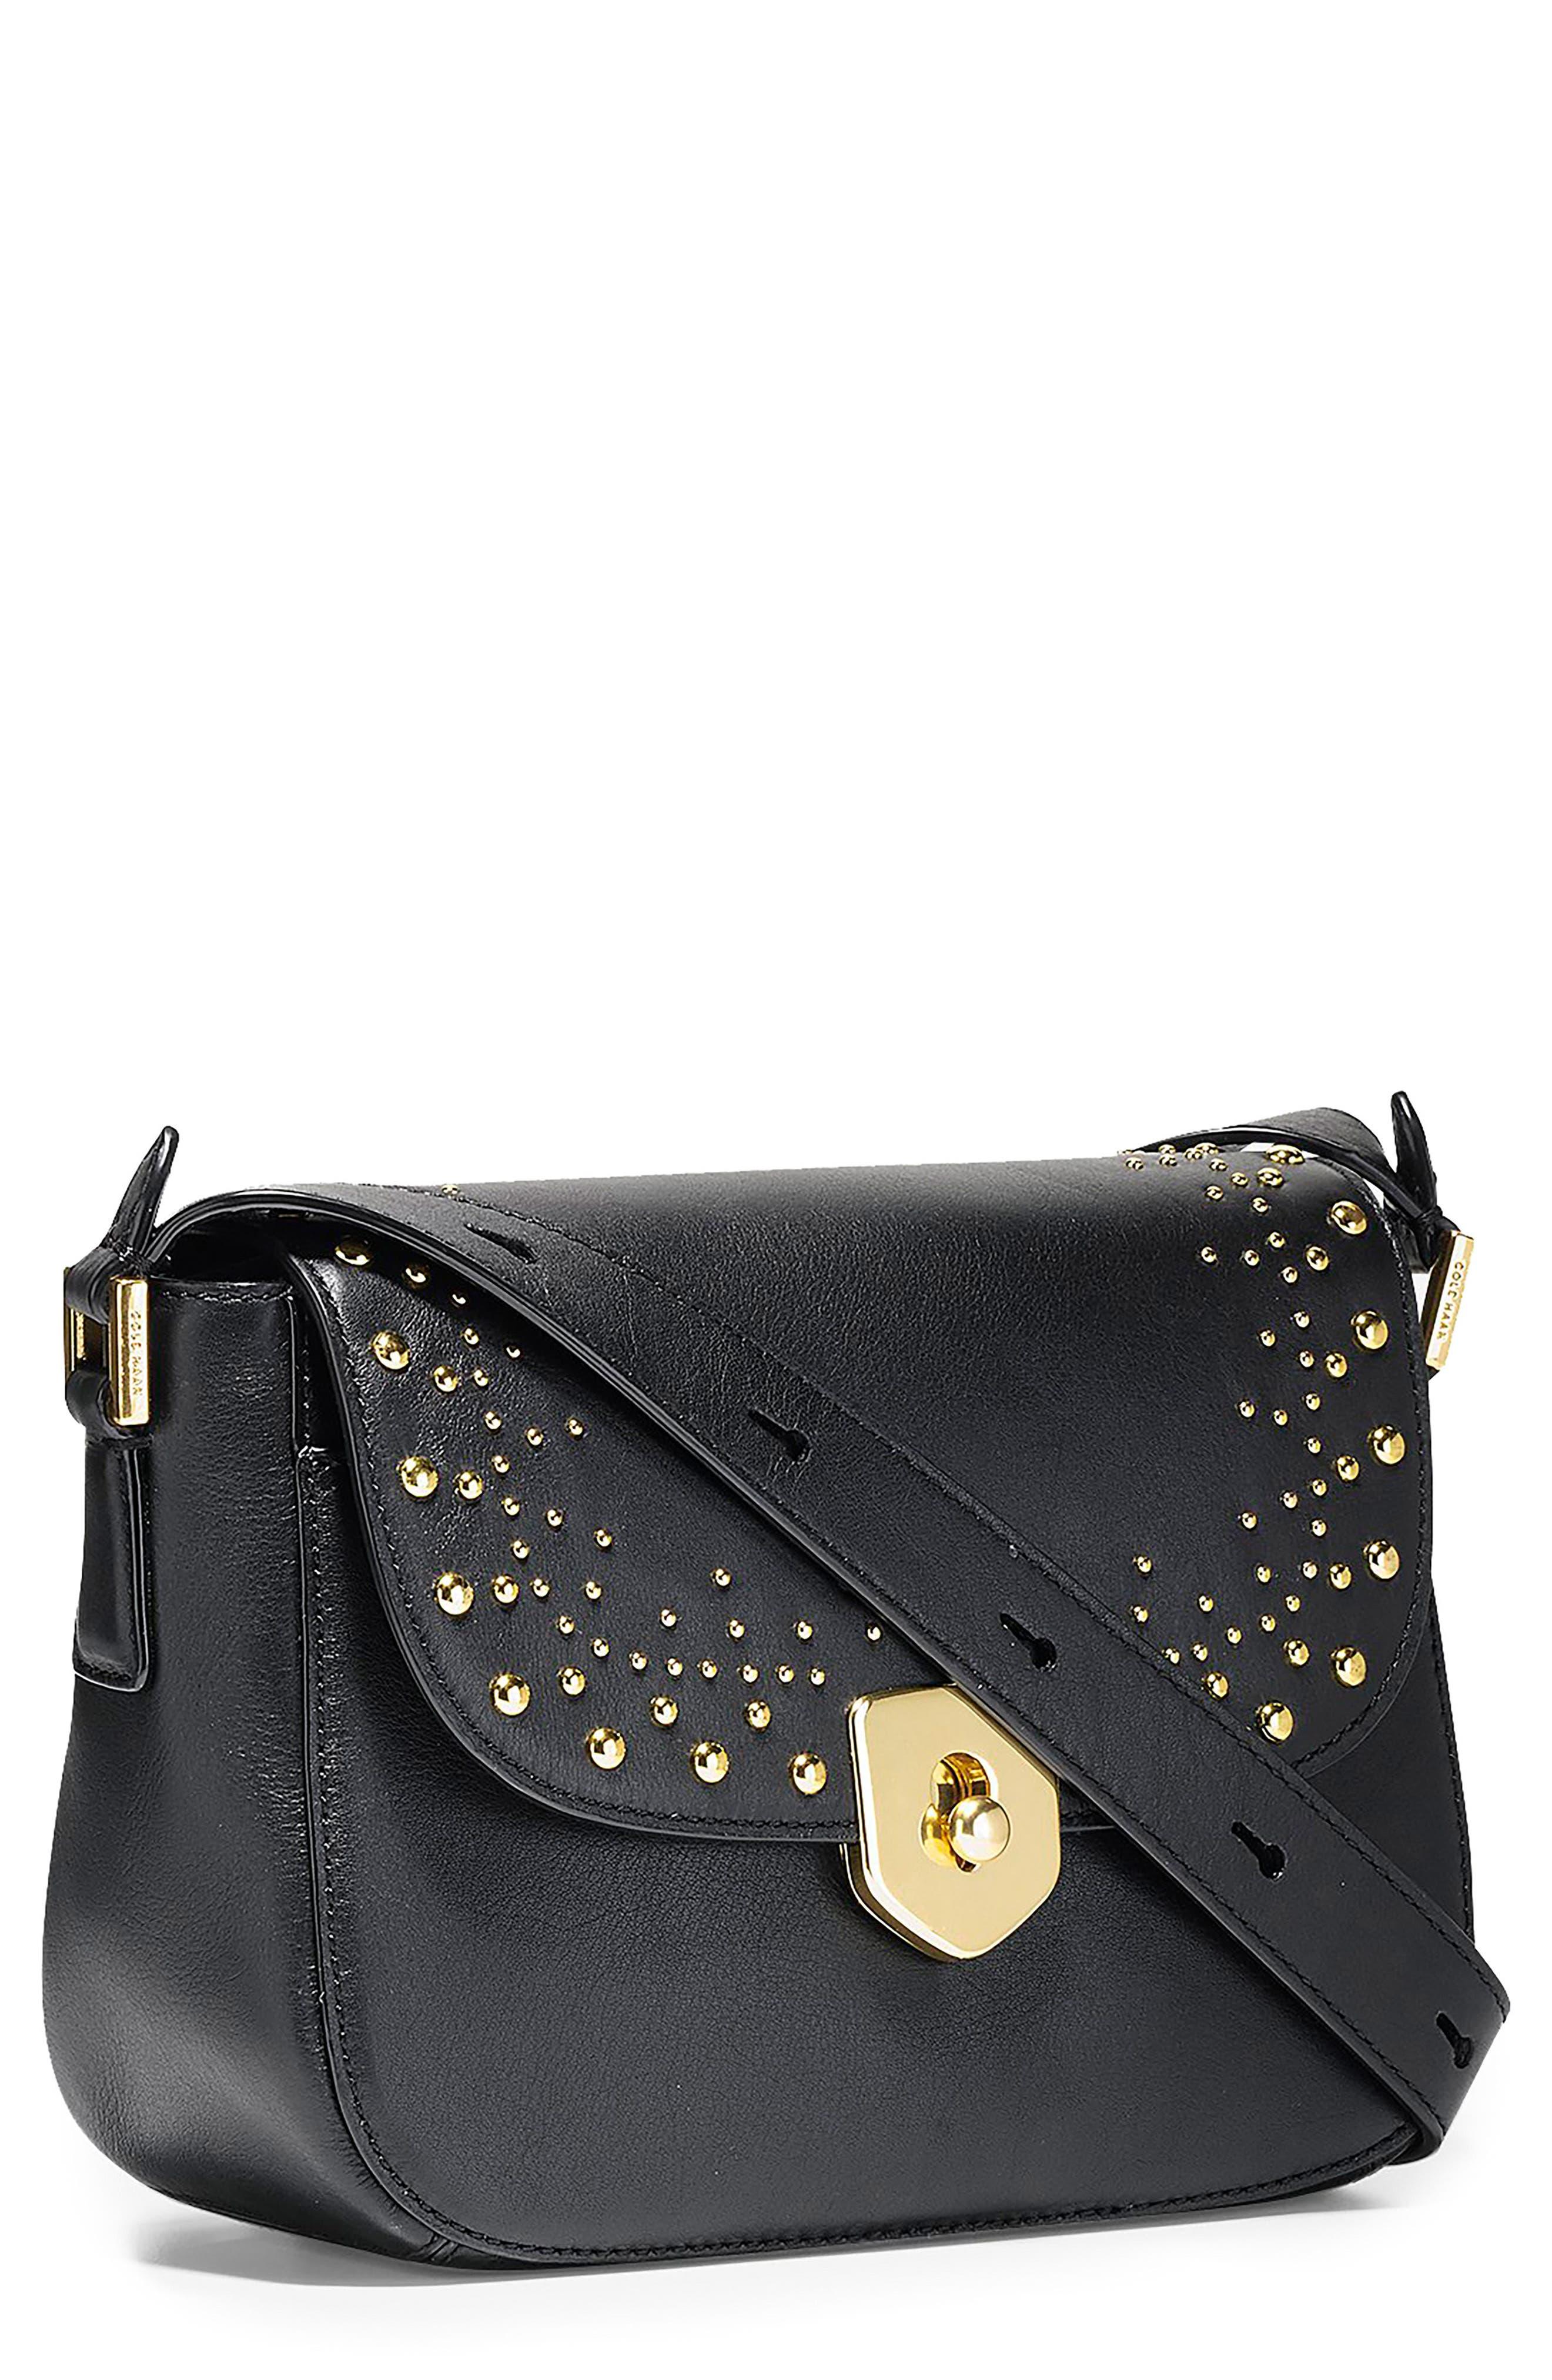 Cole Haan Mini Marli Studded Leather Saddle Bag